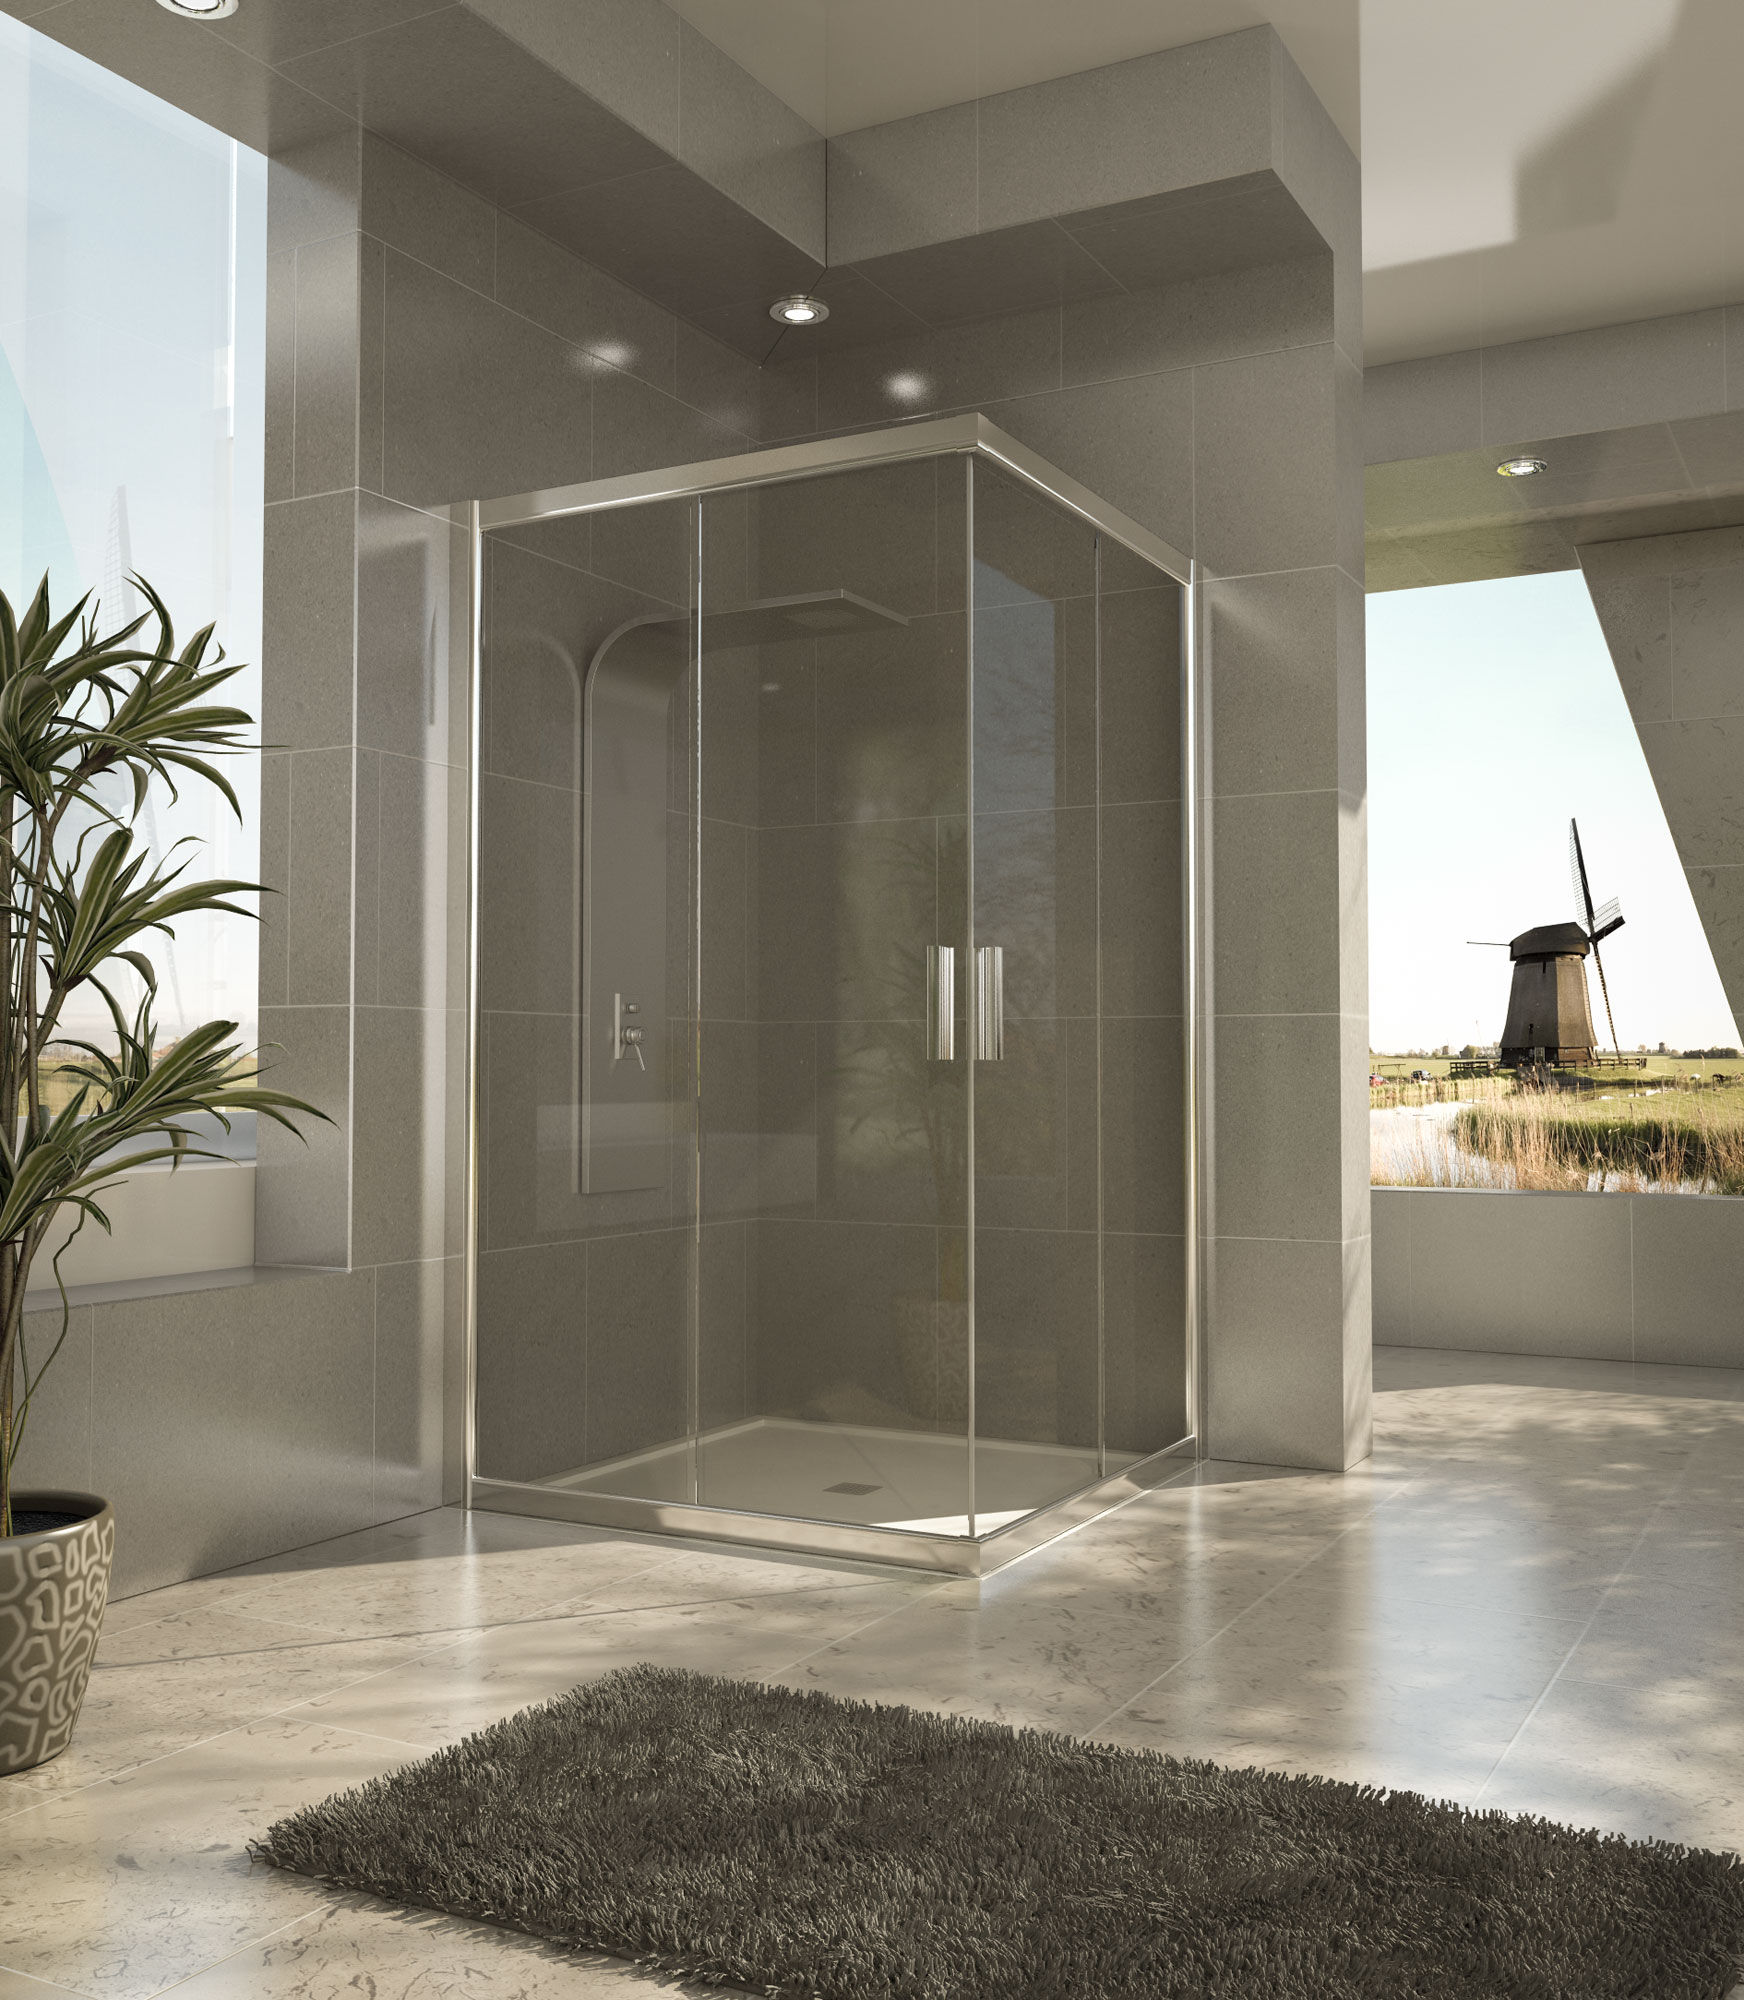 Mamparas de ducha mamparas de ducha baratas entradas - Mamparas de ducha de diseno ...